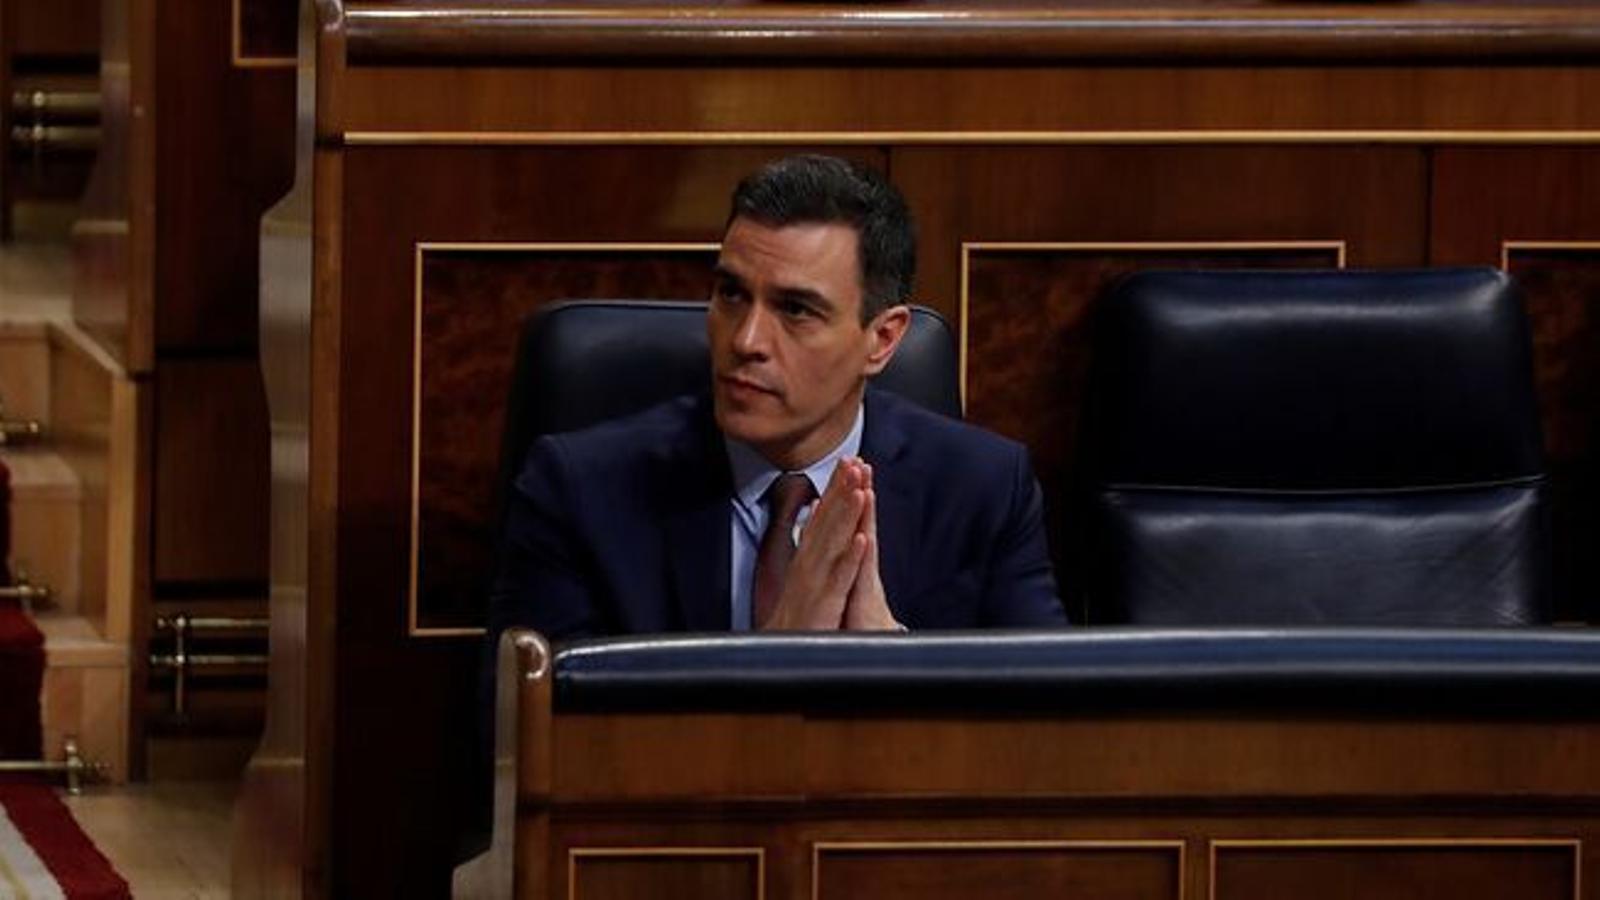 El president del govern espanyol, Pedro Sánchez, en una imatge d'arxiu.